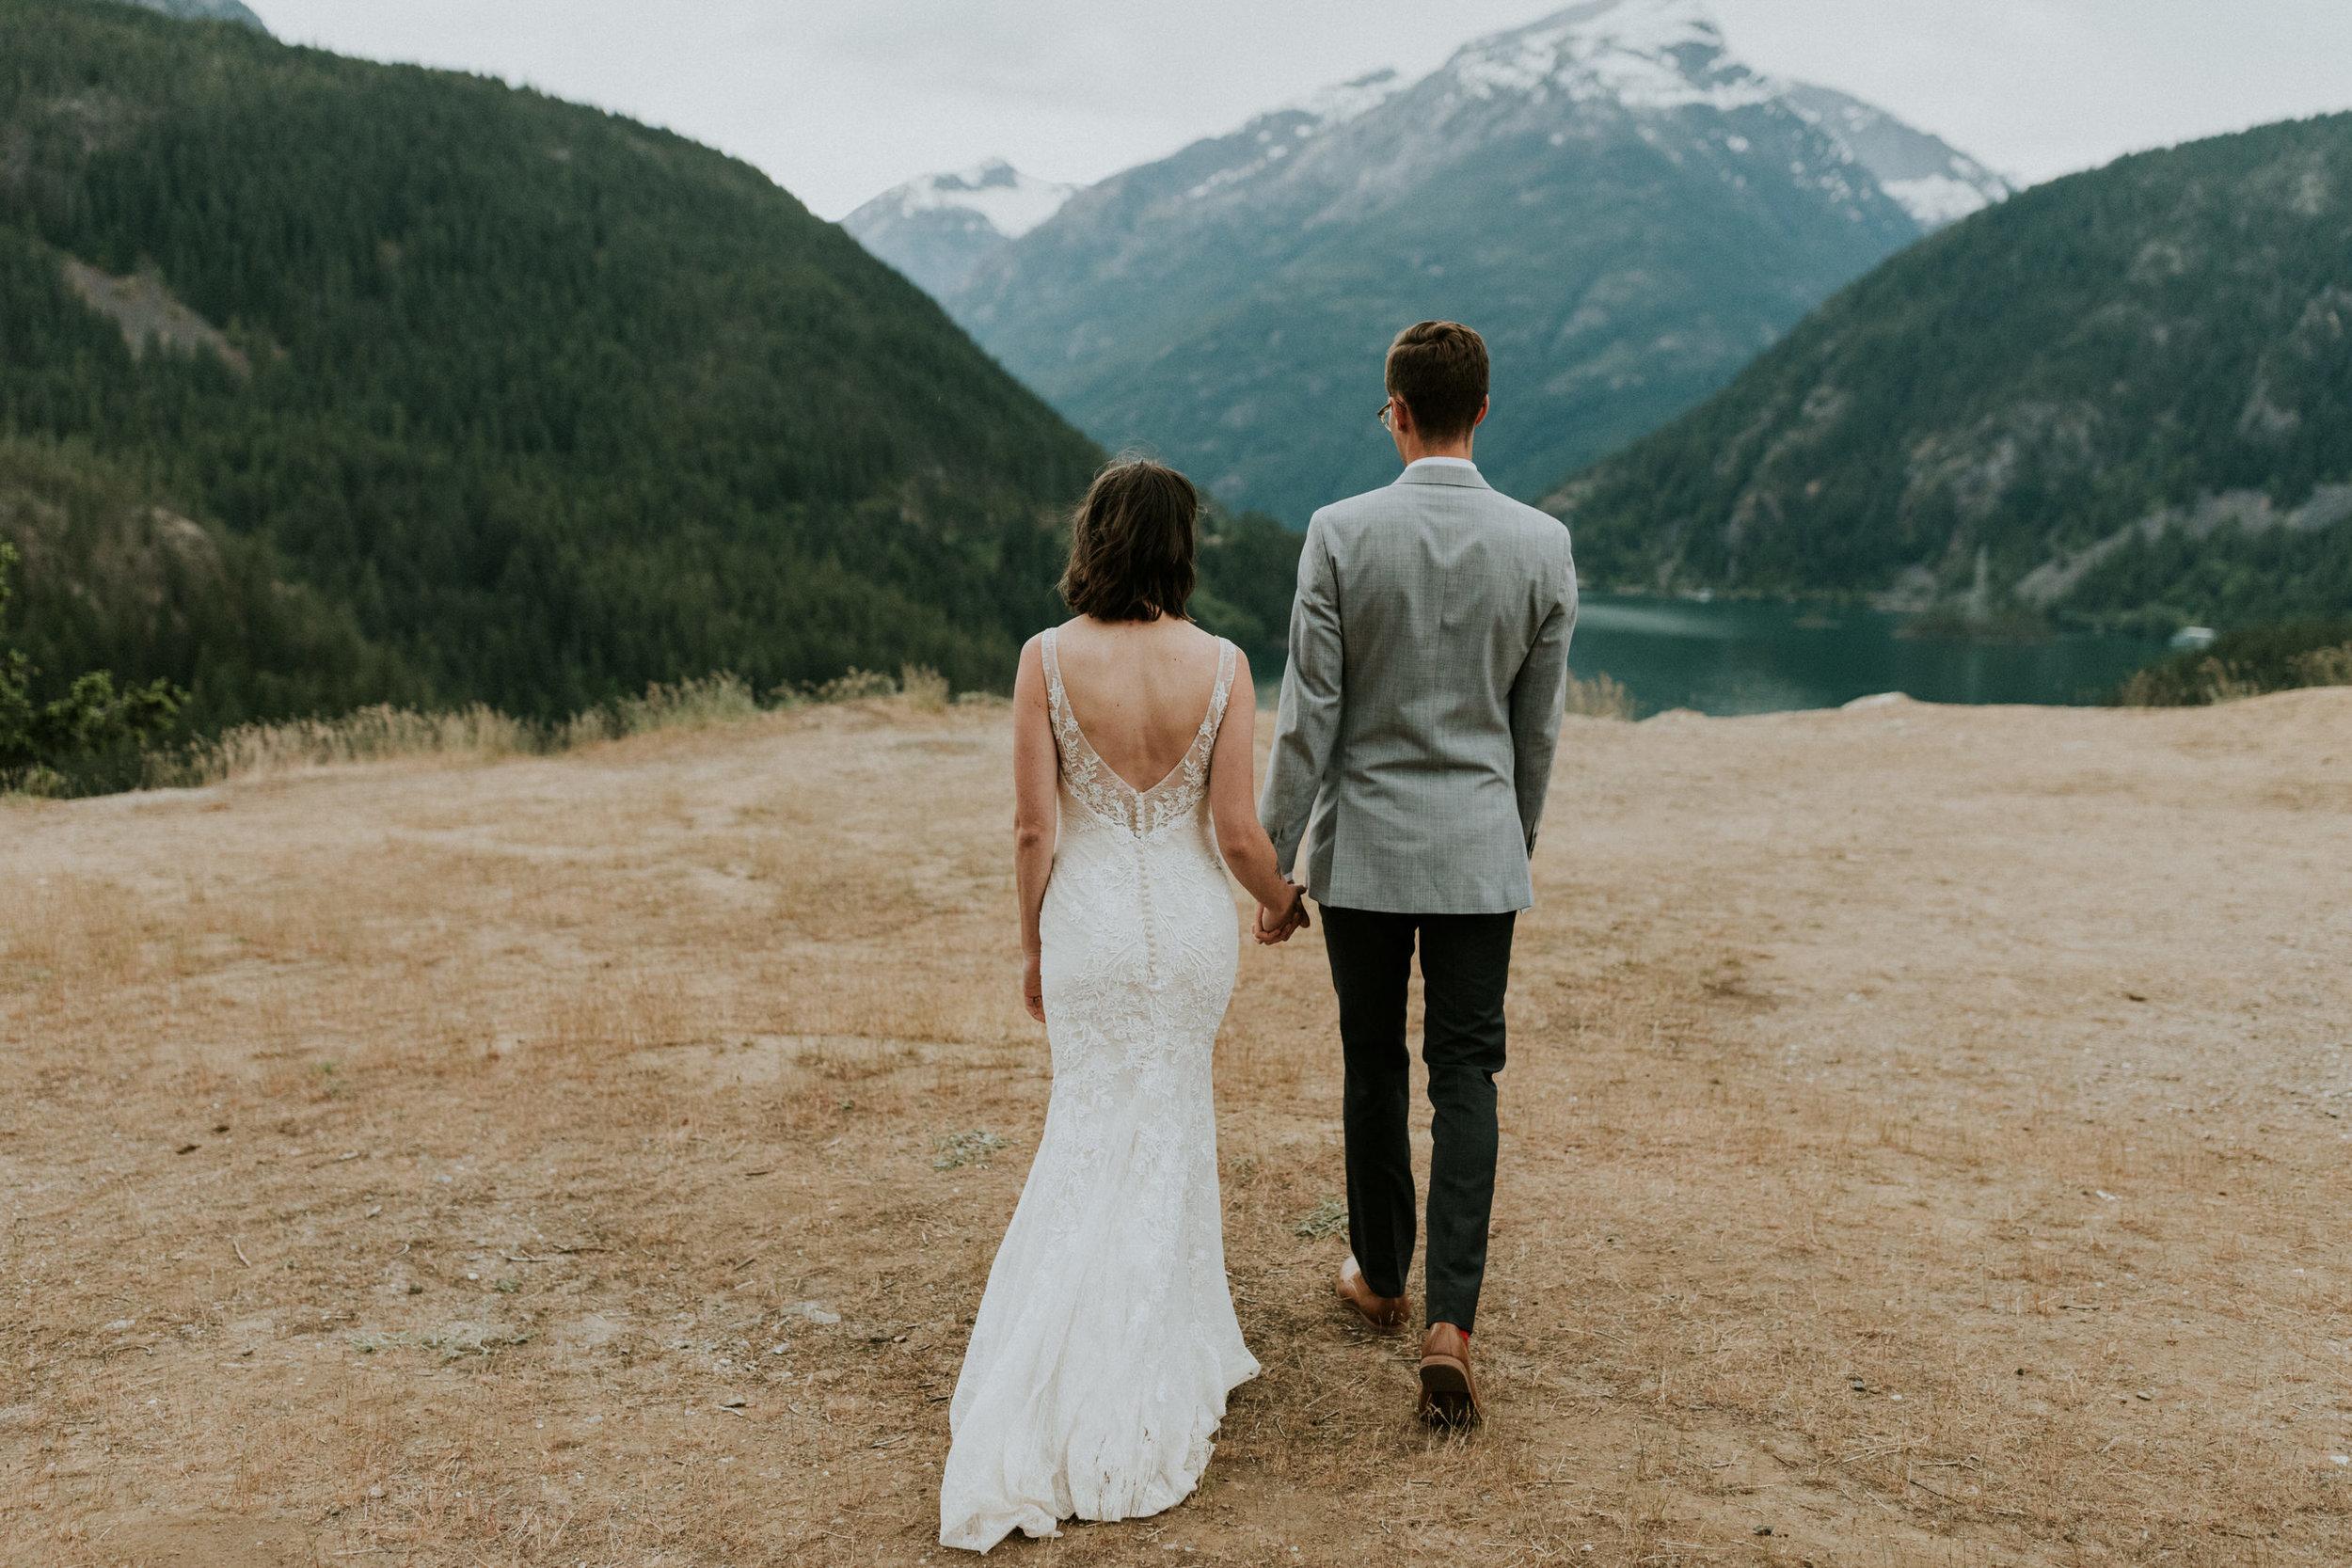 Ellie&Matt-wedding-seattle-diablolake52.jpg